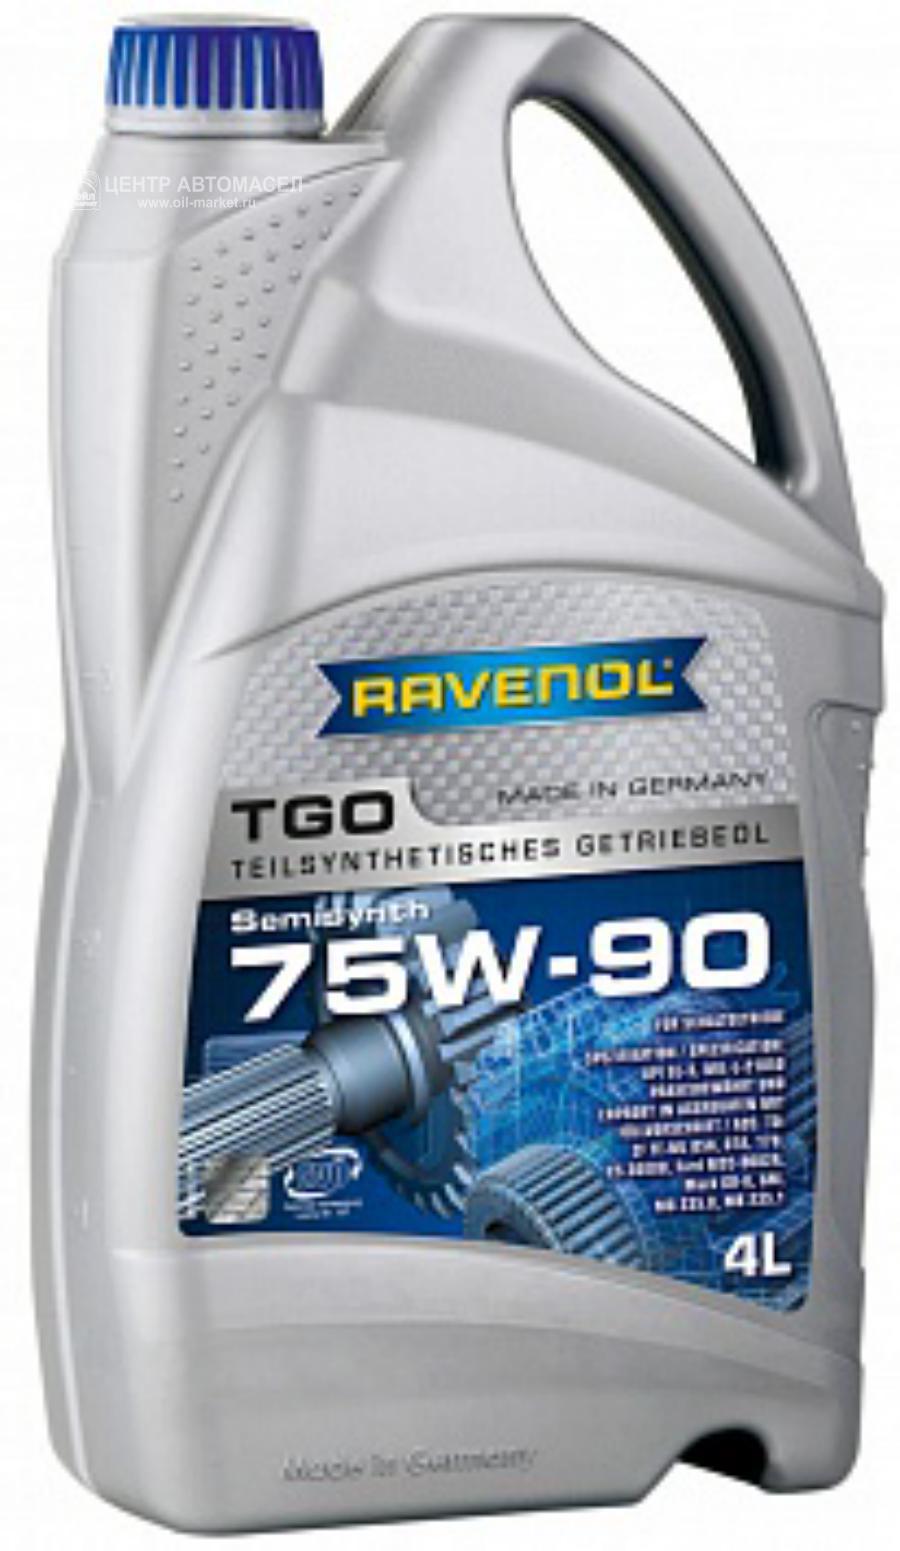 Масло трансмиссионное RAVENOL Getriebeoel TGO SAE 75W-90 API GL 5